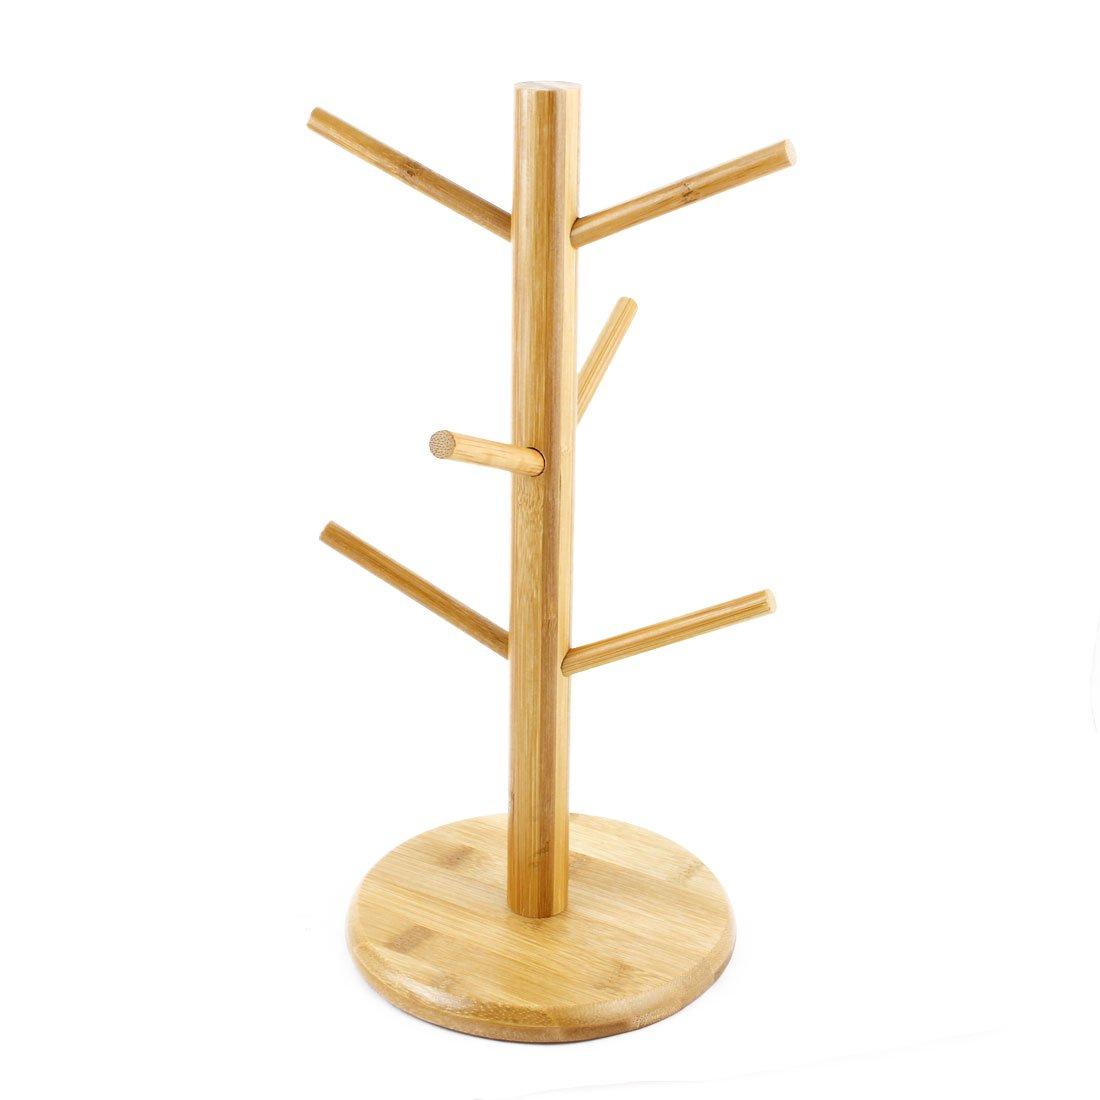 uxcell Bamboo Household Hanging Display Coffee Tea Glass Cup Holder Bracket Mug Tree a16120100ux0238